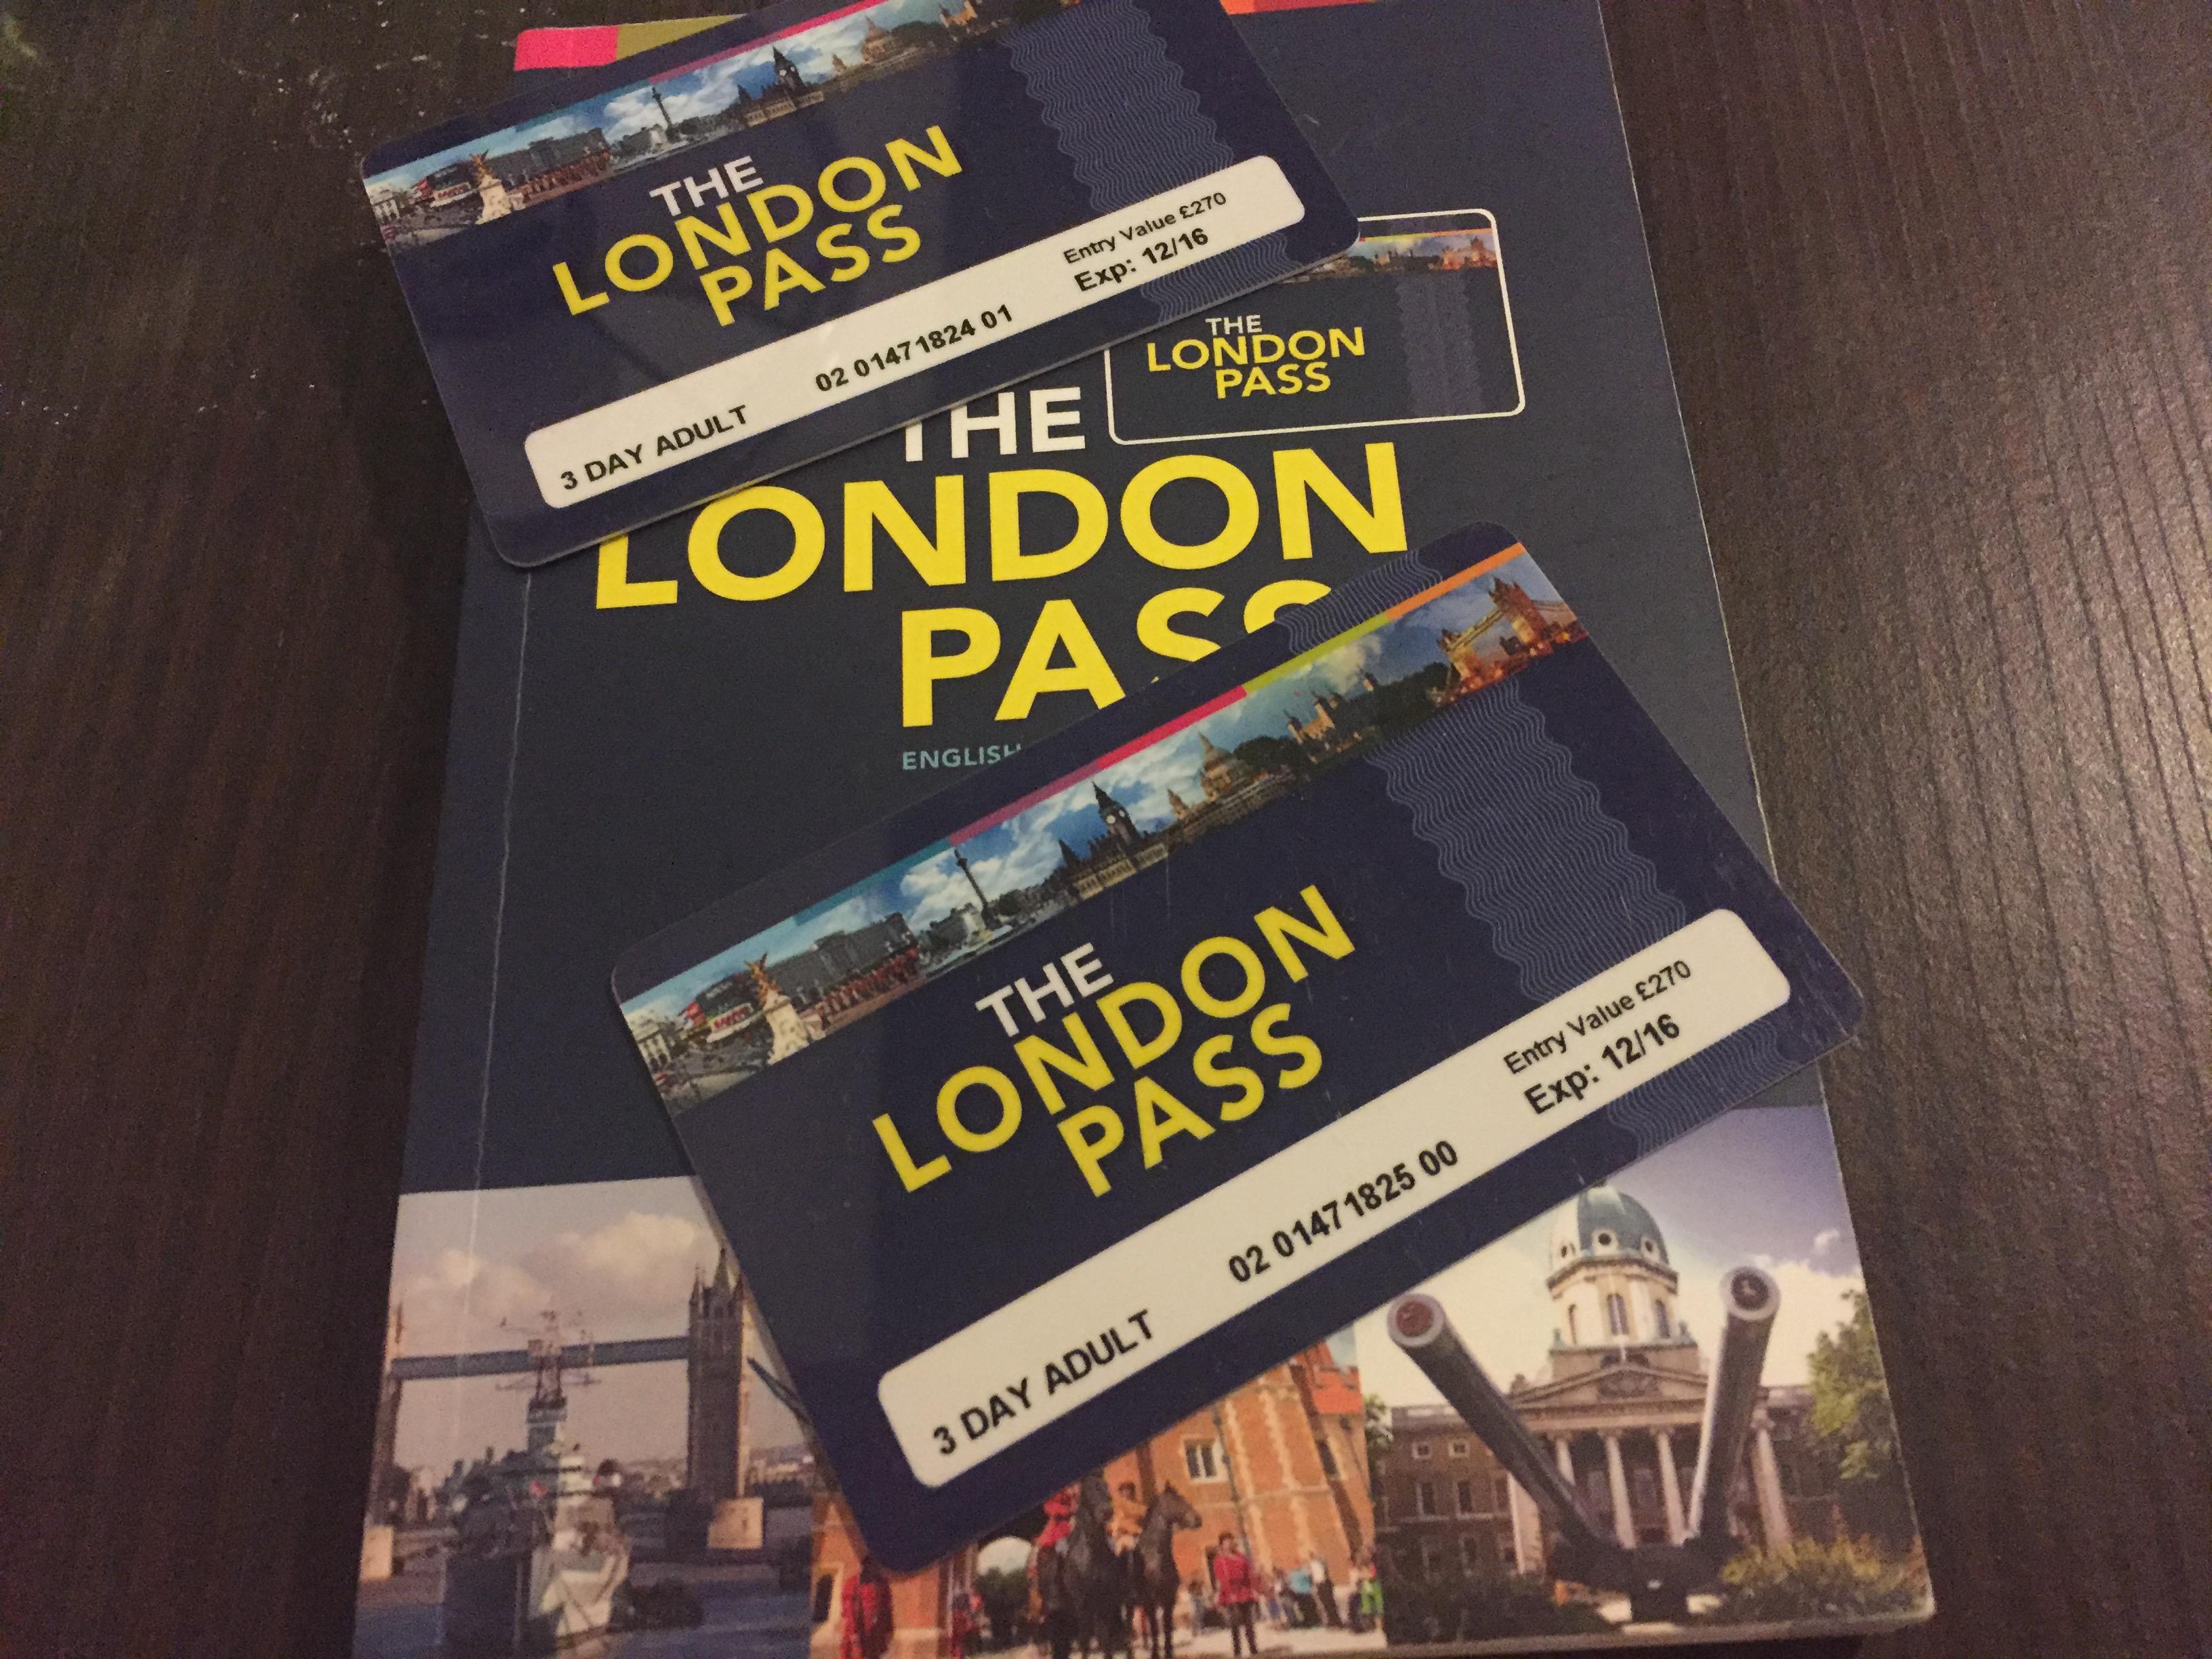 img 6848 - La tarjeta de atracciones turísticas London Pass